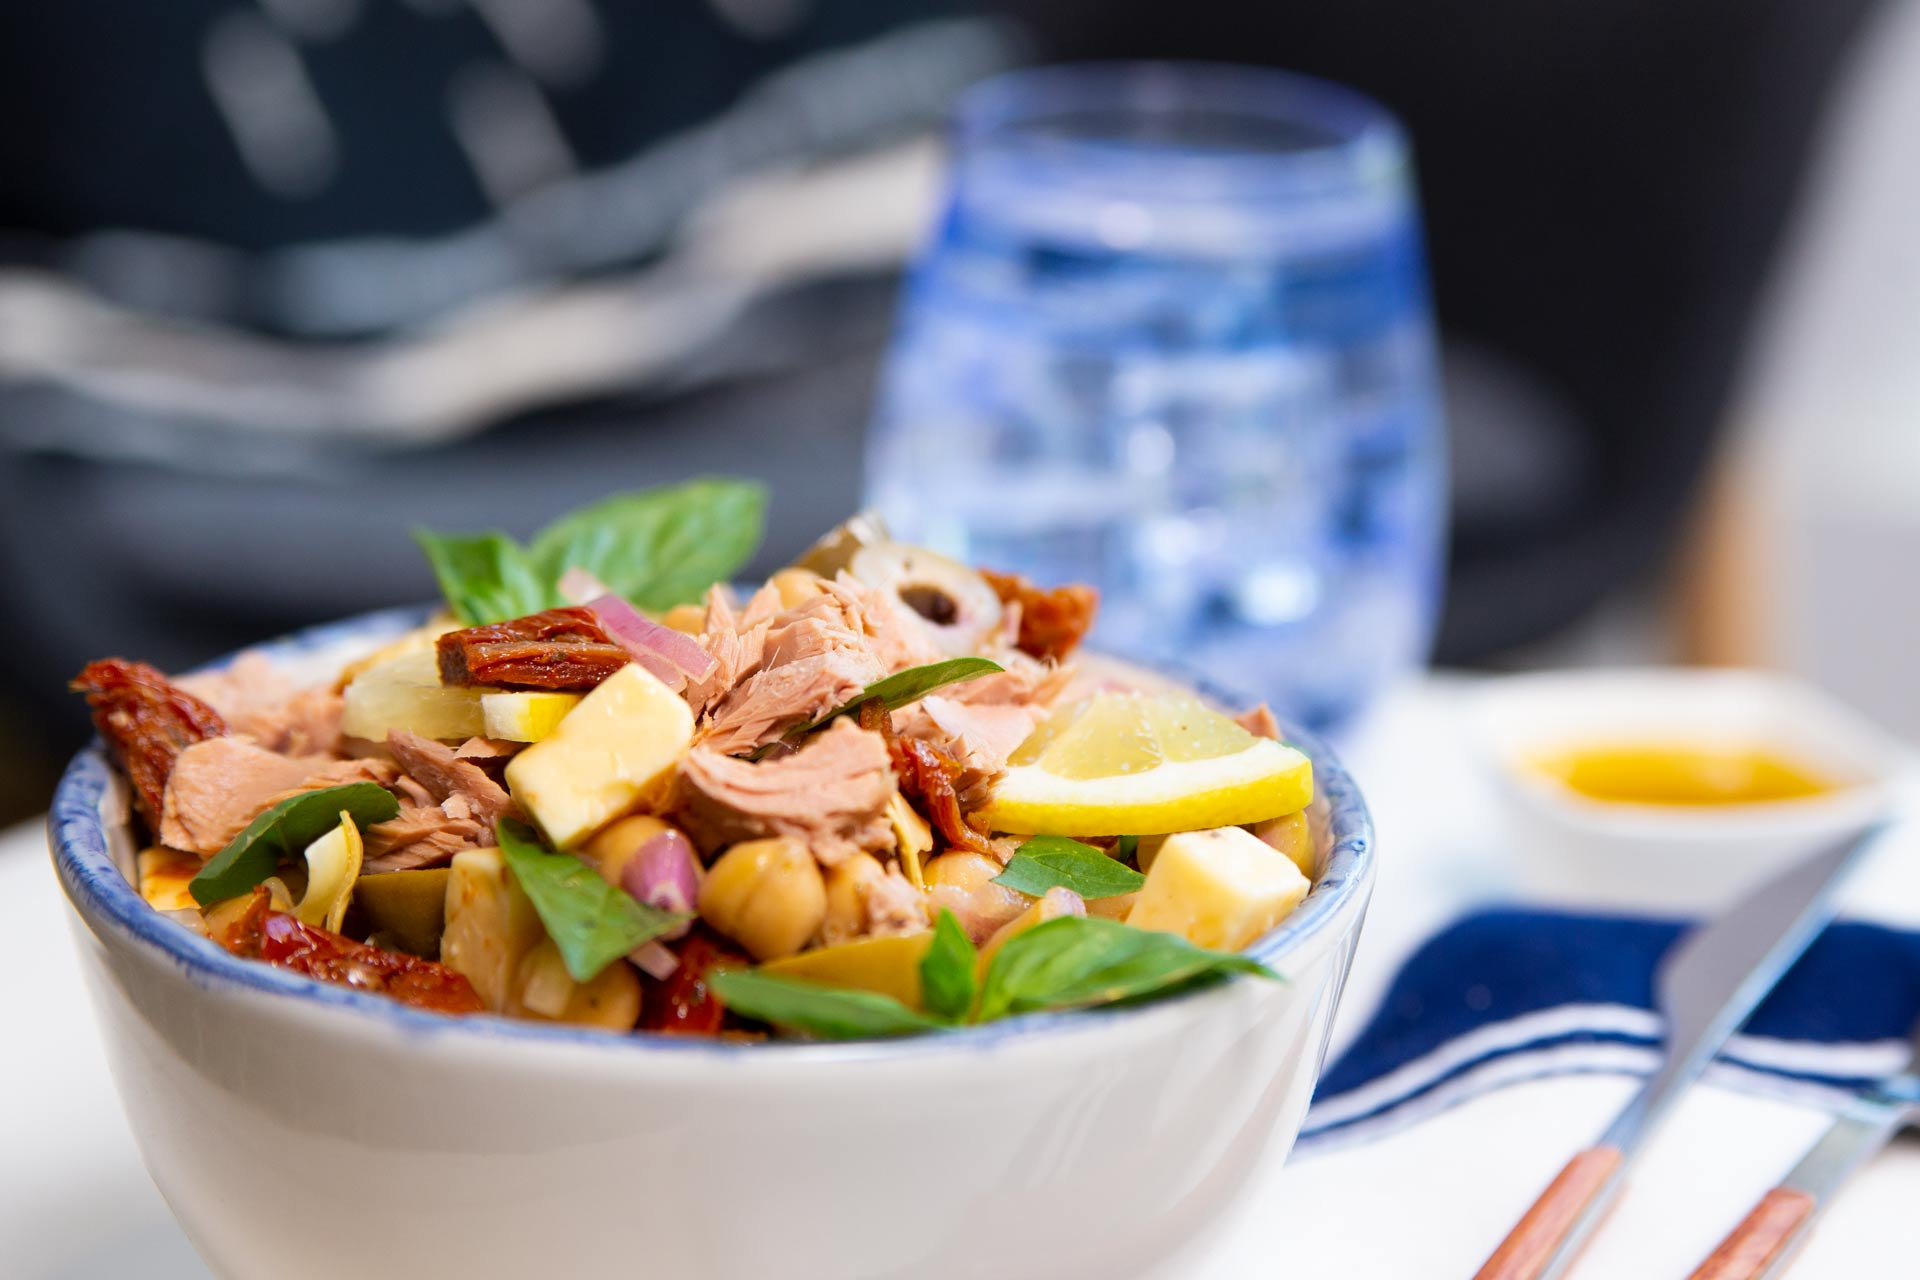 15 Minute Tuna Meal Prep Salad